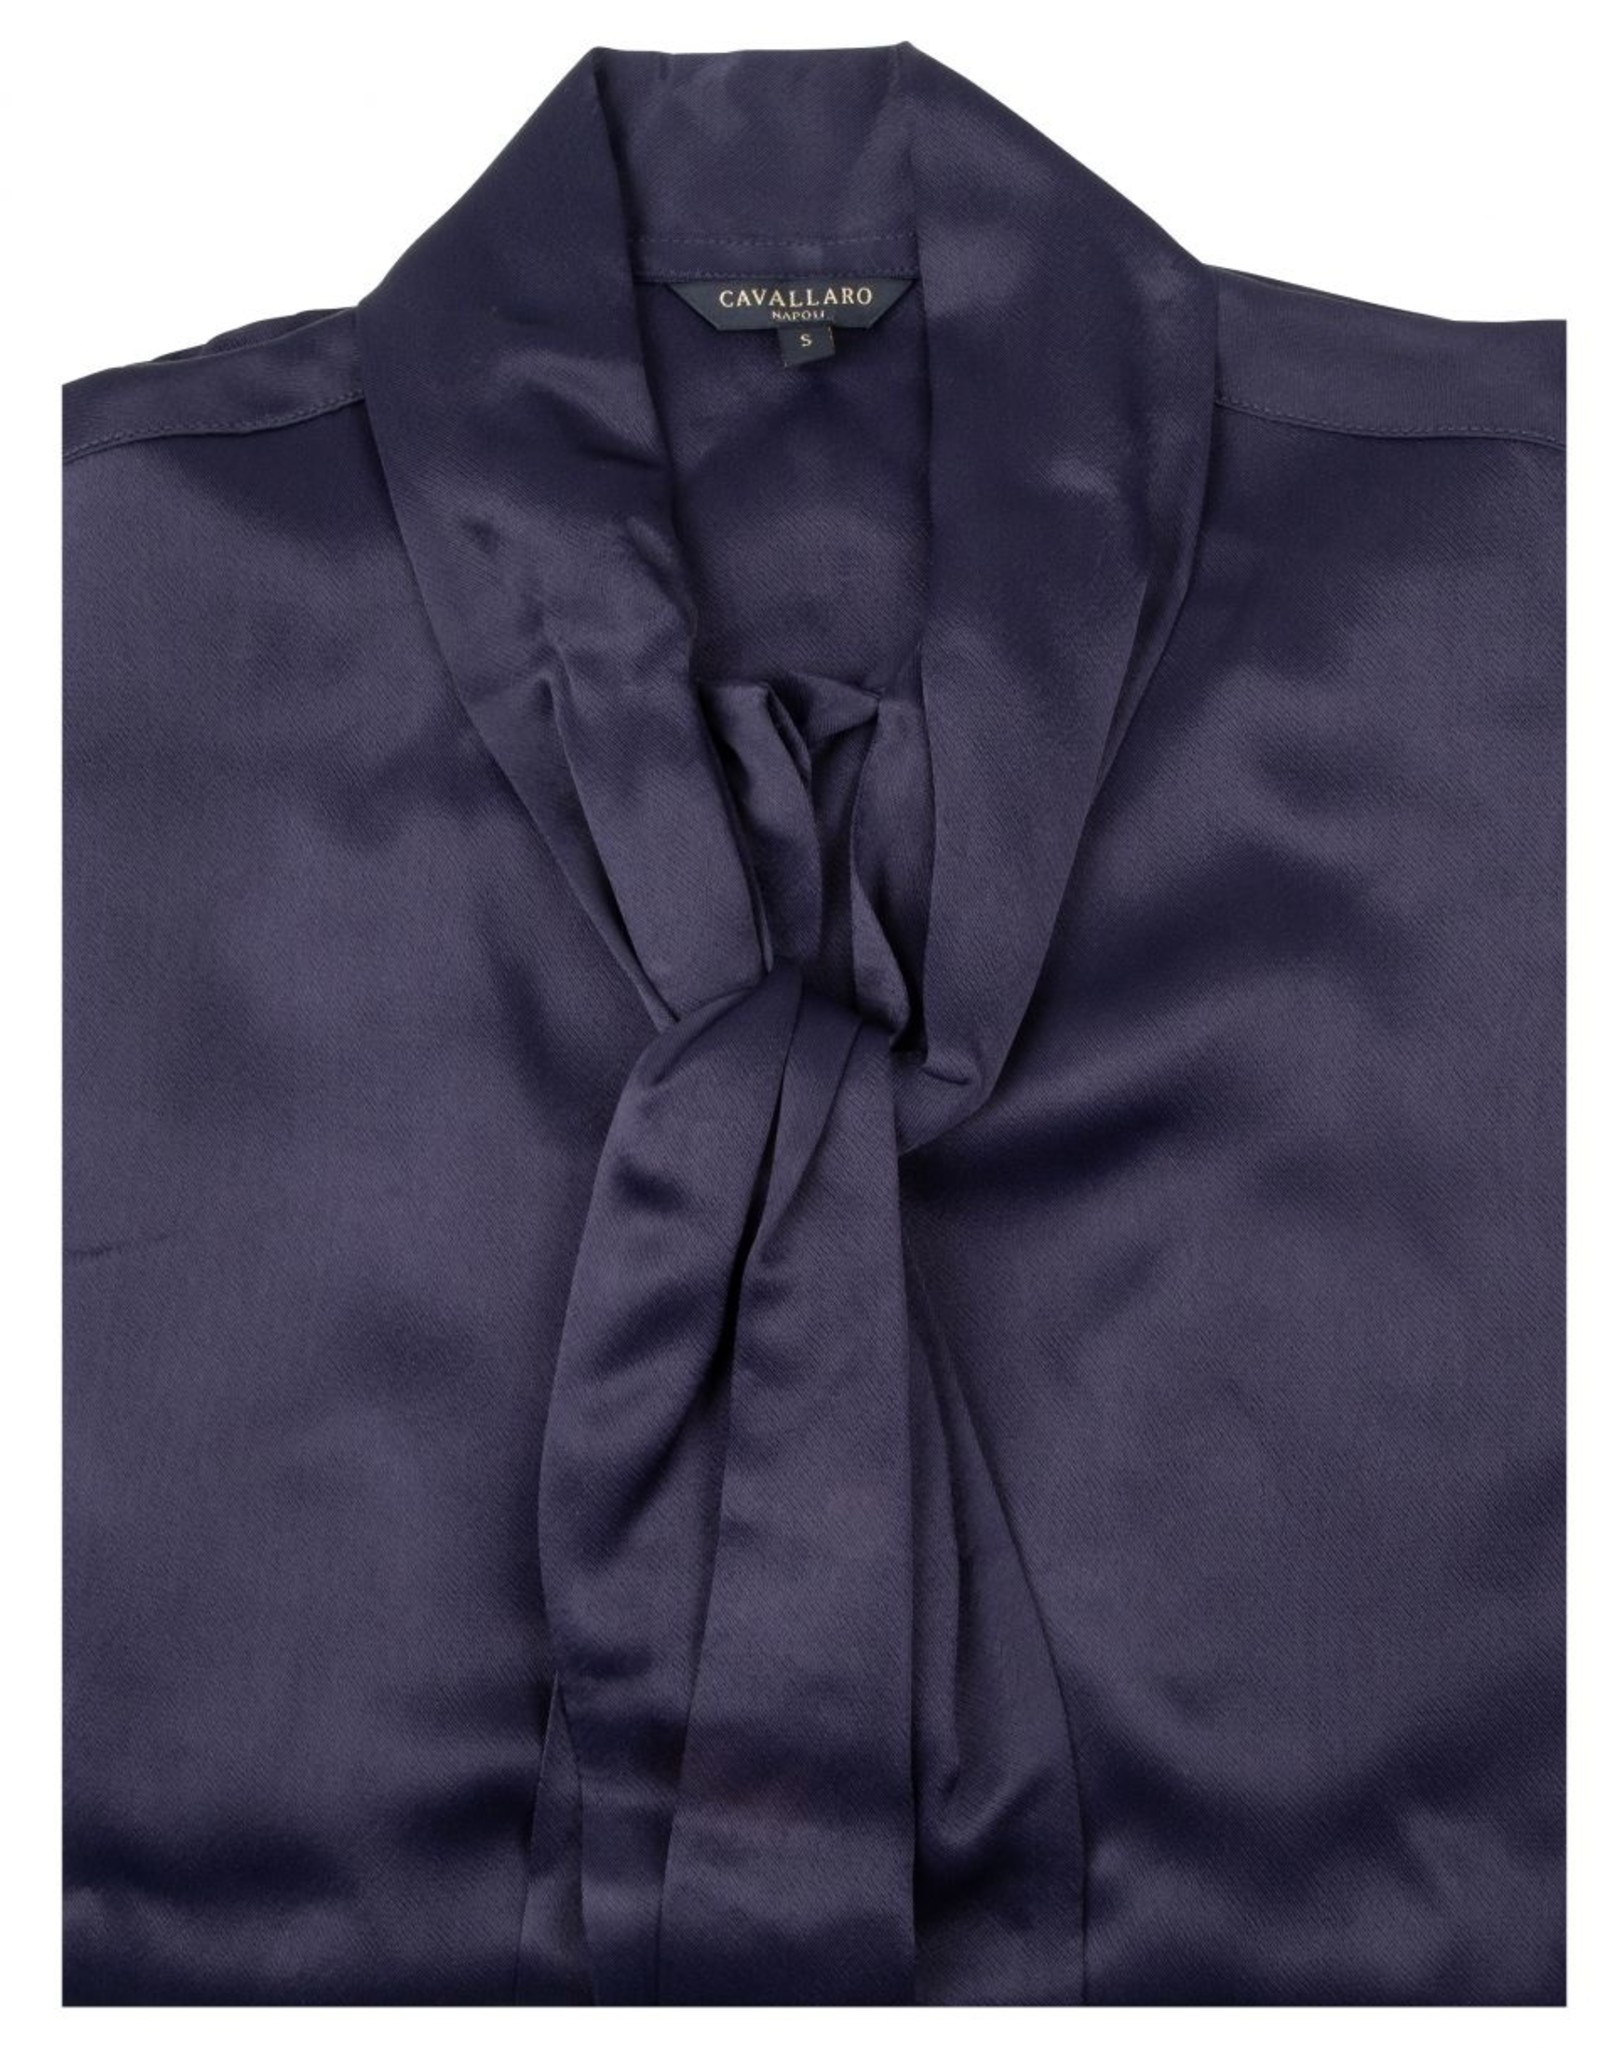 Cavallaro Blouse Bowa Dark Blue